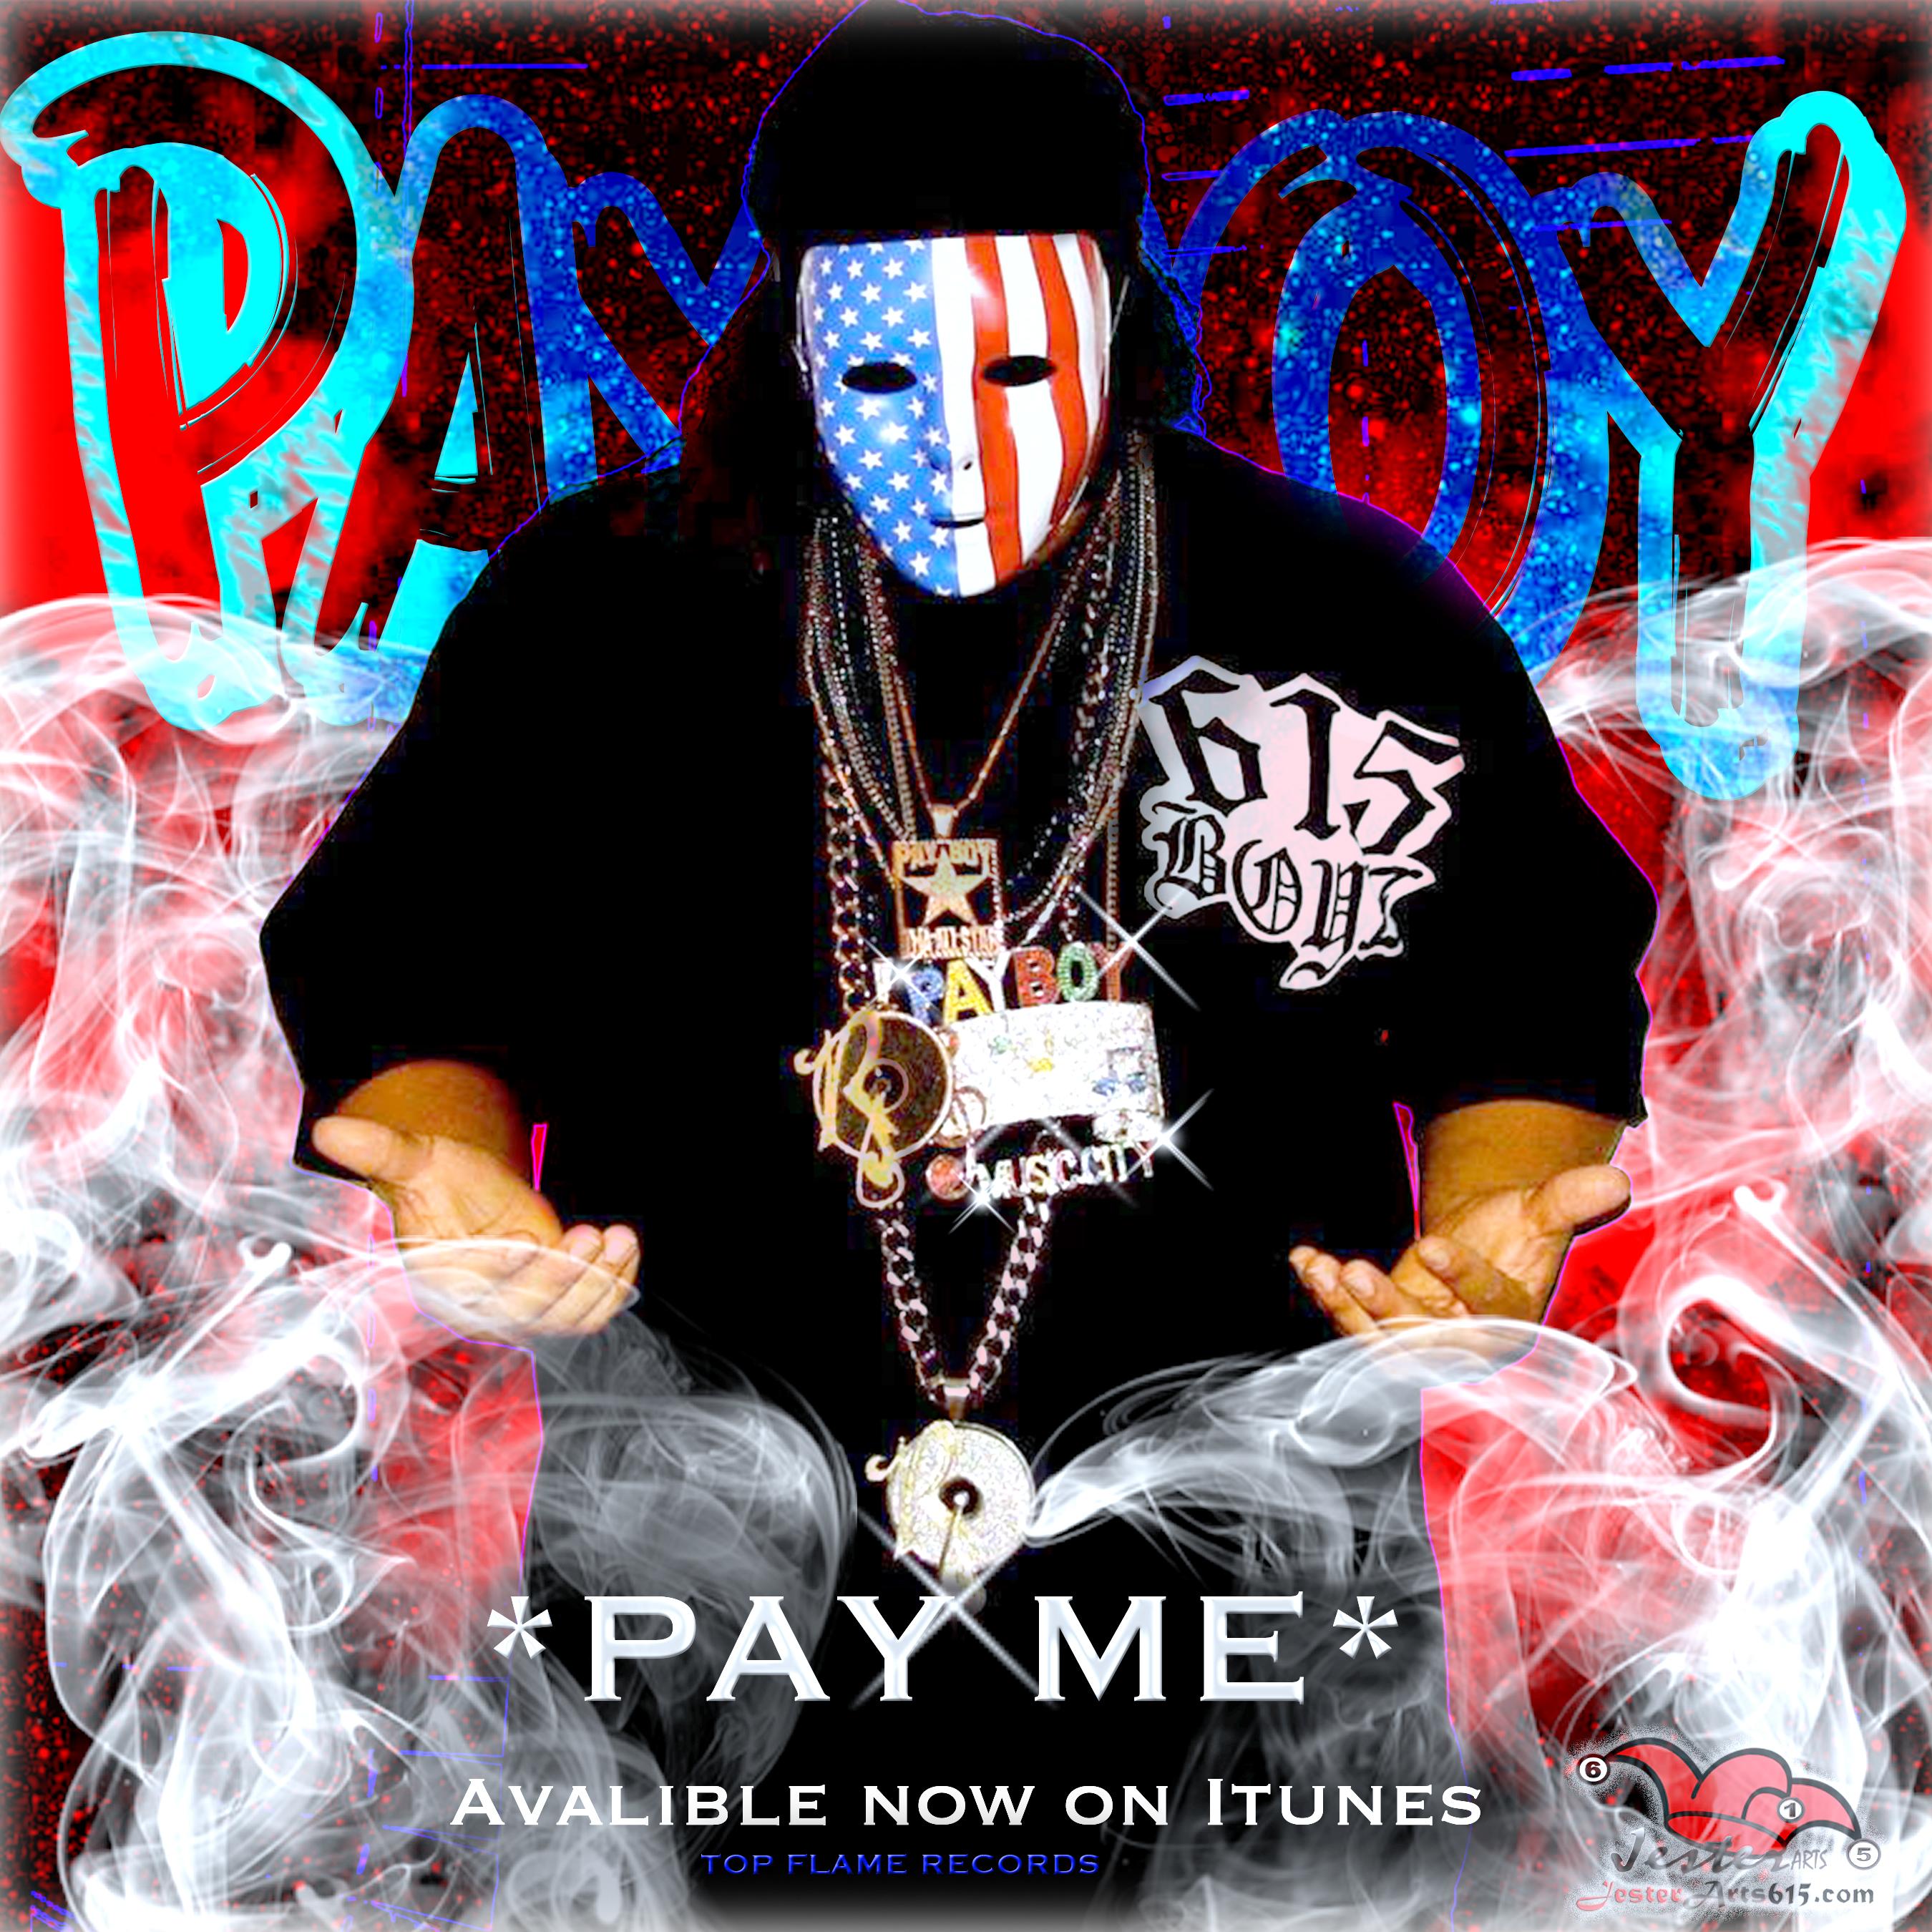 Payboy